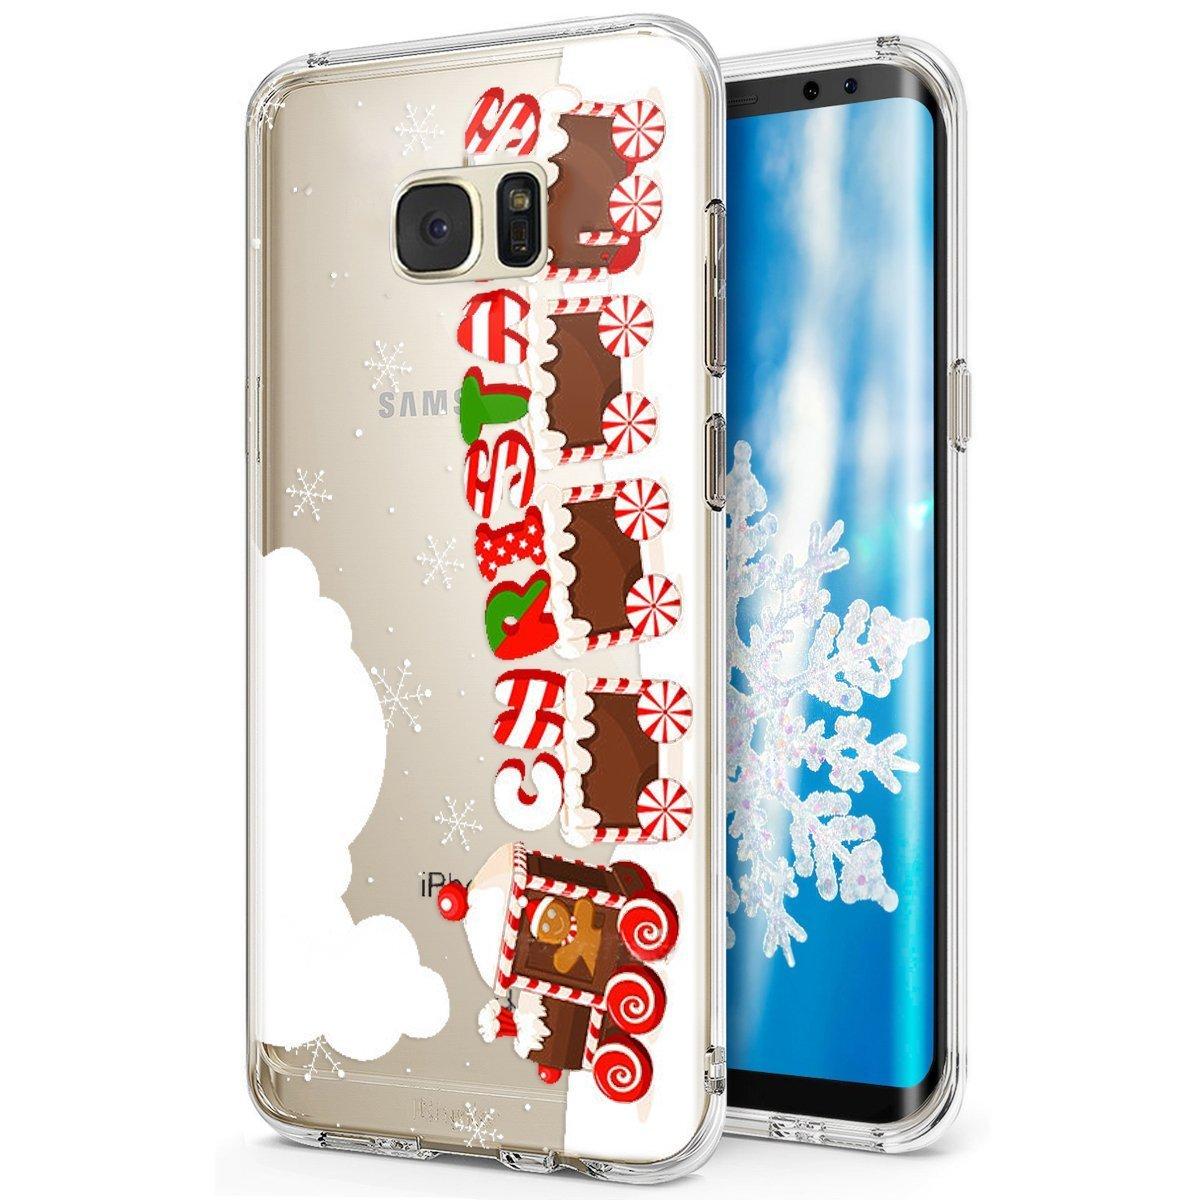 H/ülle f/ür Samsung Galaxy S6,Samsung G920 Silikonh/ülle Herbests Samsung Galaxy S6 Samsung G920 Transparent Schutzh/ülle Silikon Handyh/ülle Ultra Slim Crystal Clear,Ultra D/ünn Case Schlank Etui Bumper-Style Premium Kratzfest Sof